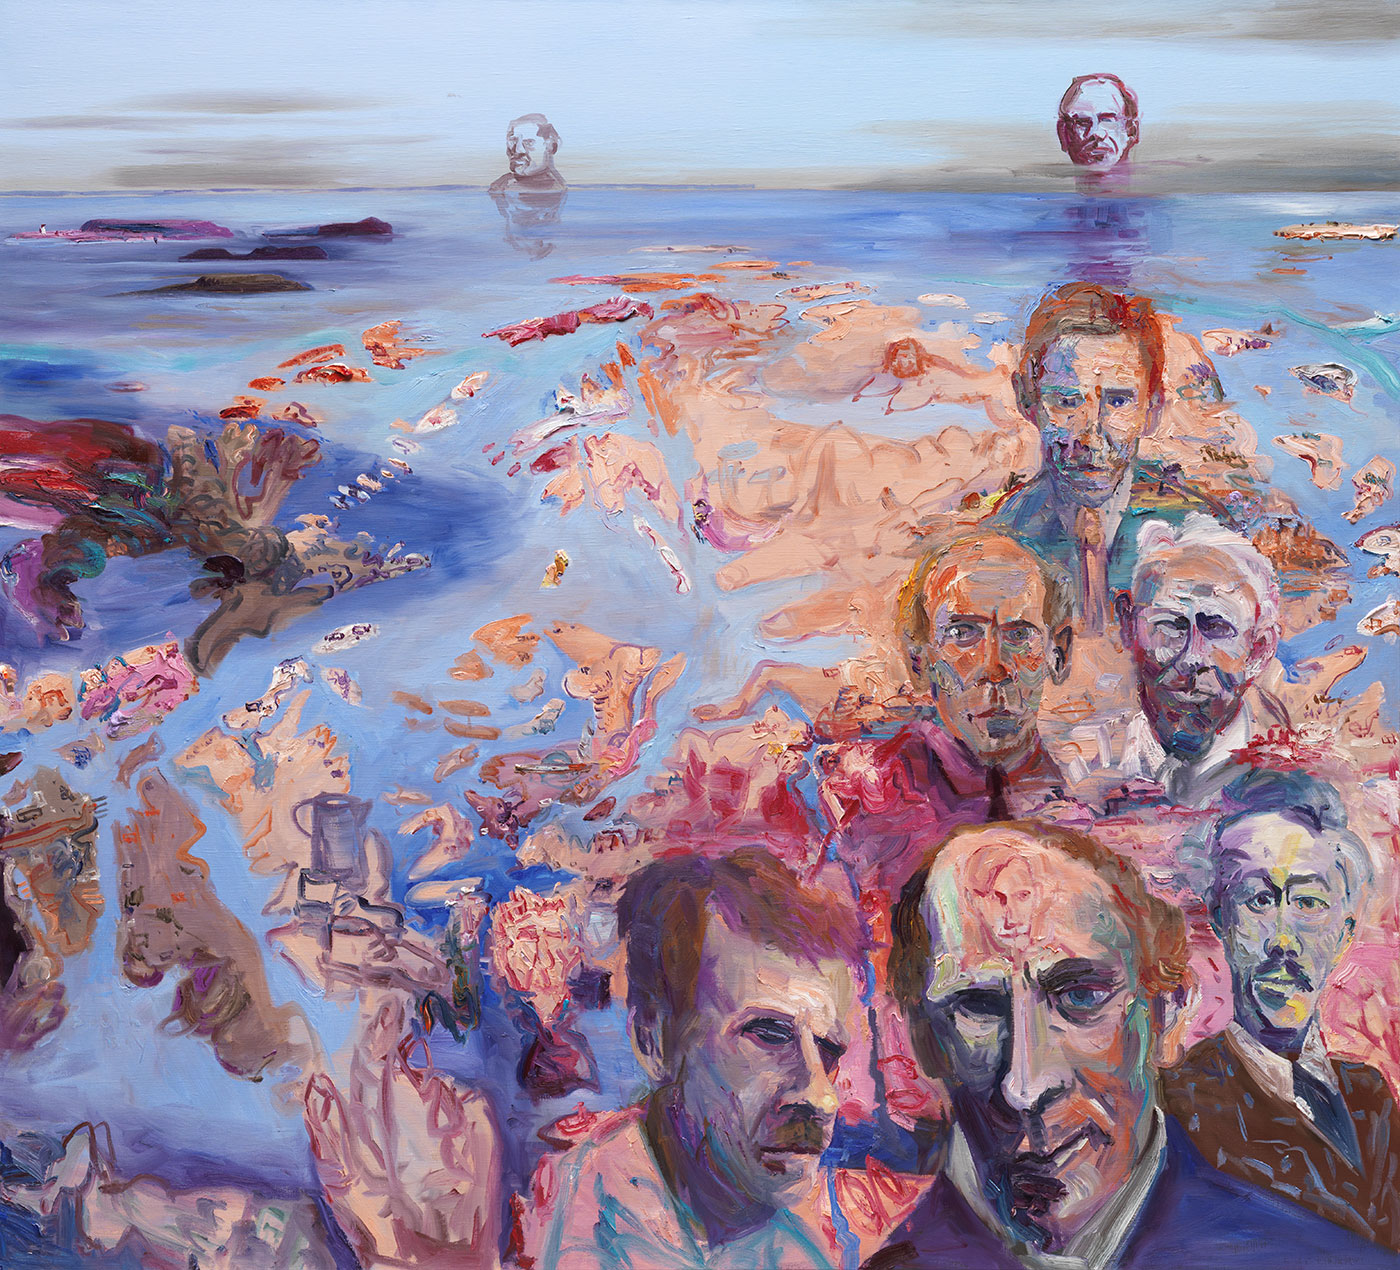 Artwork by John Hartman